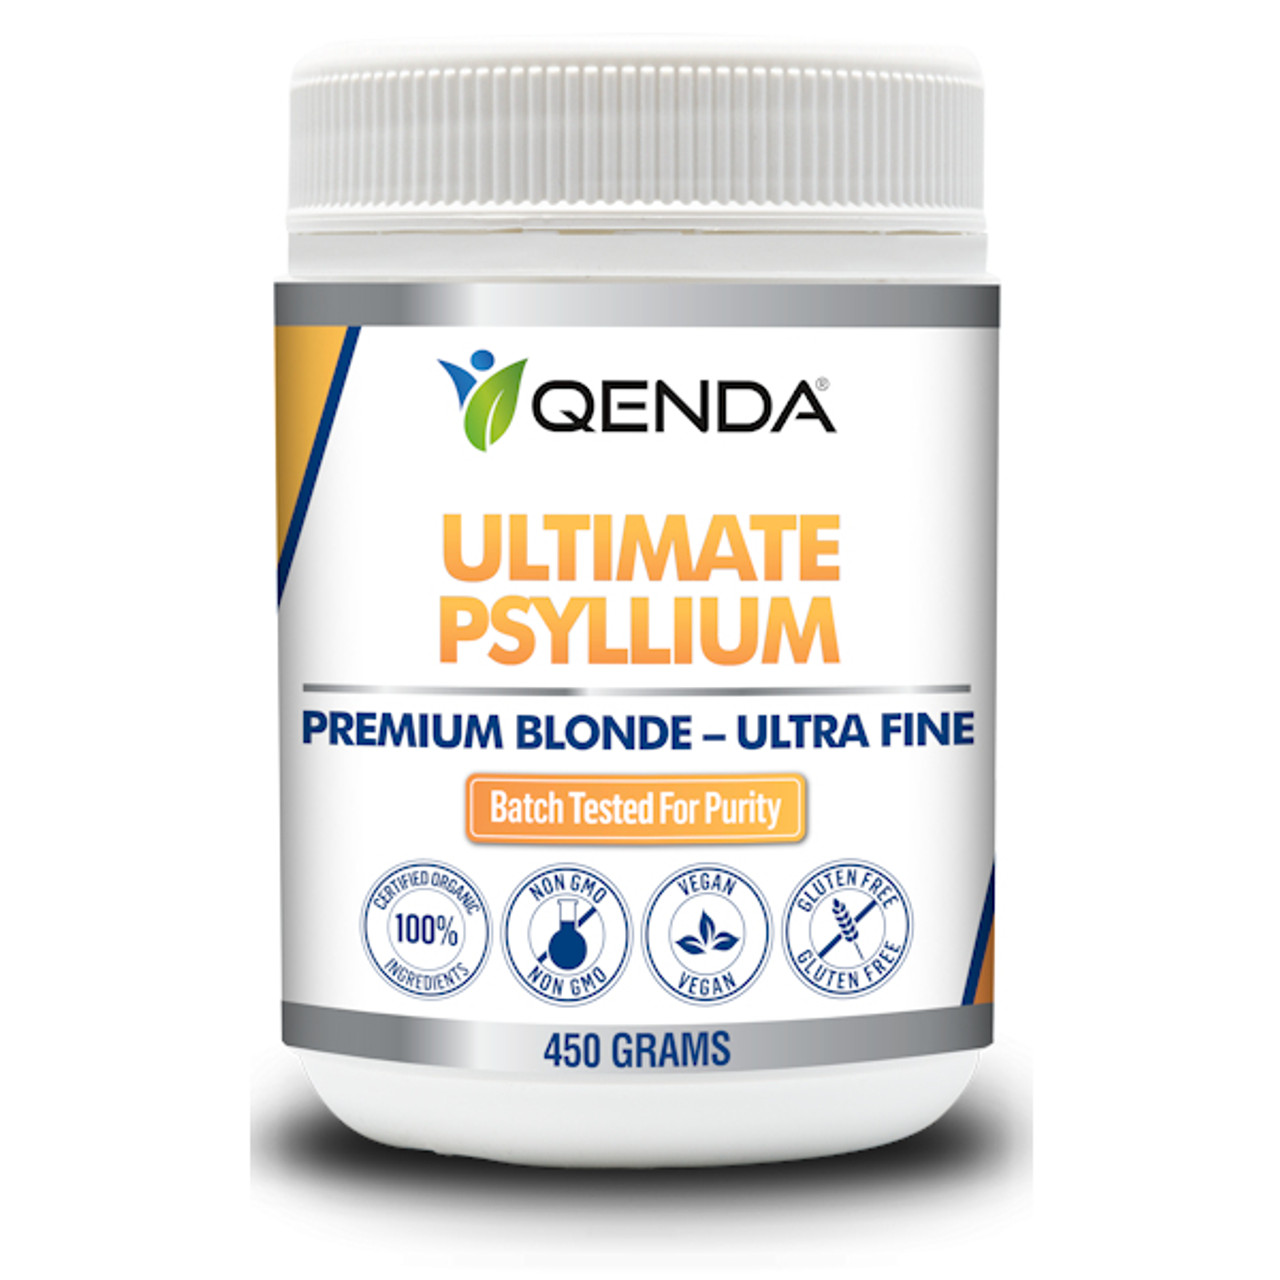 Qenda Ultimate Psyllium Original 450g